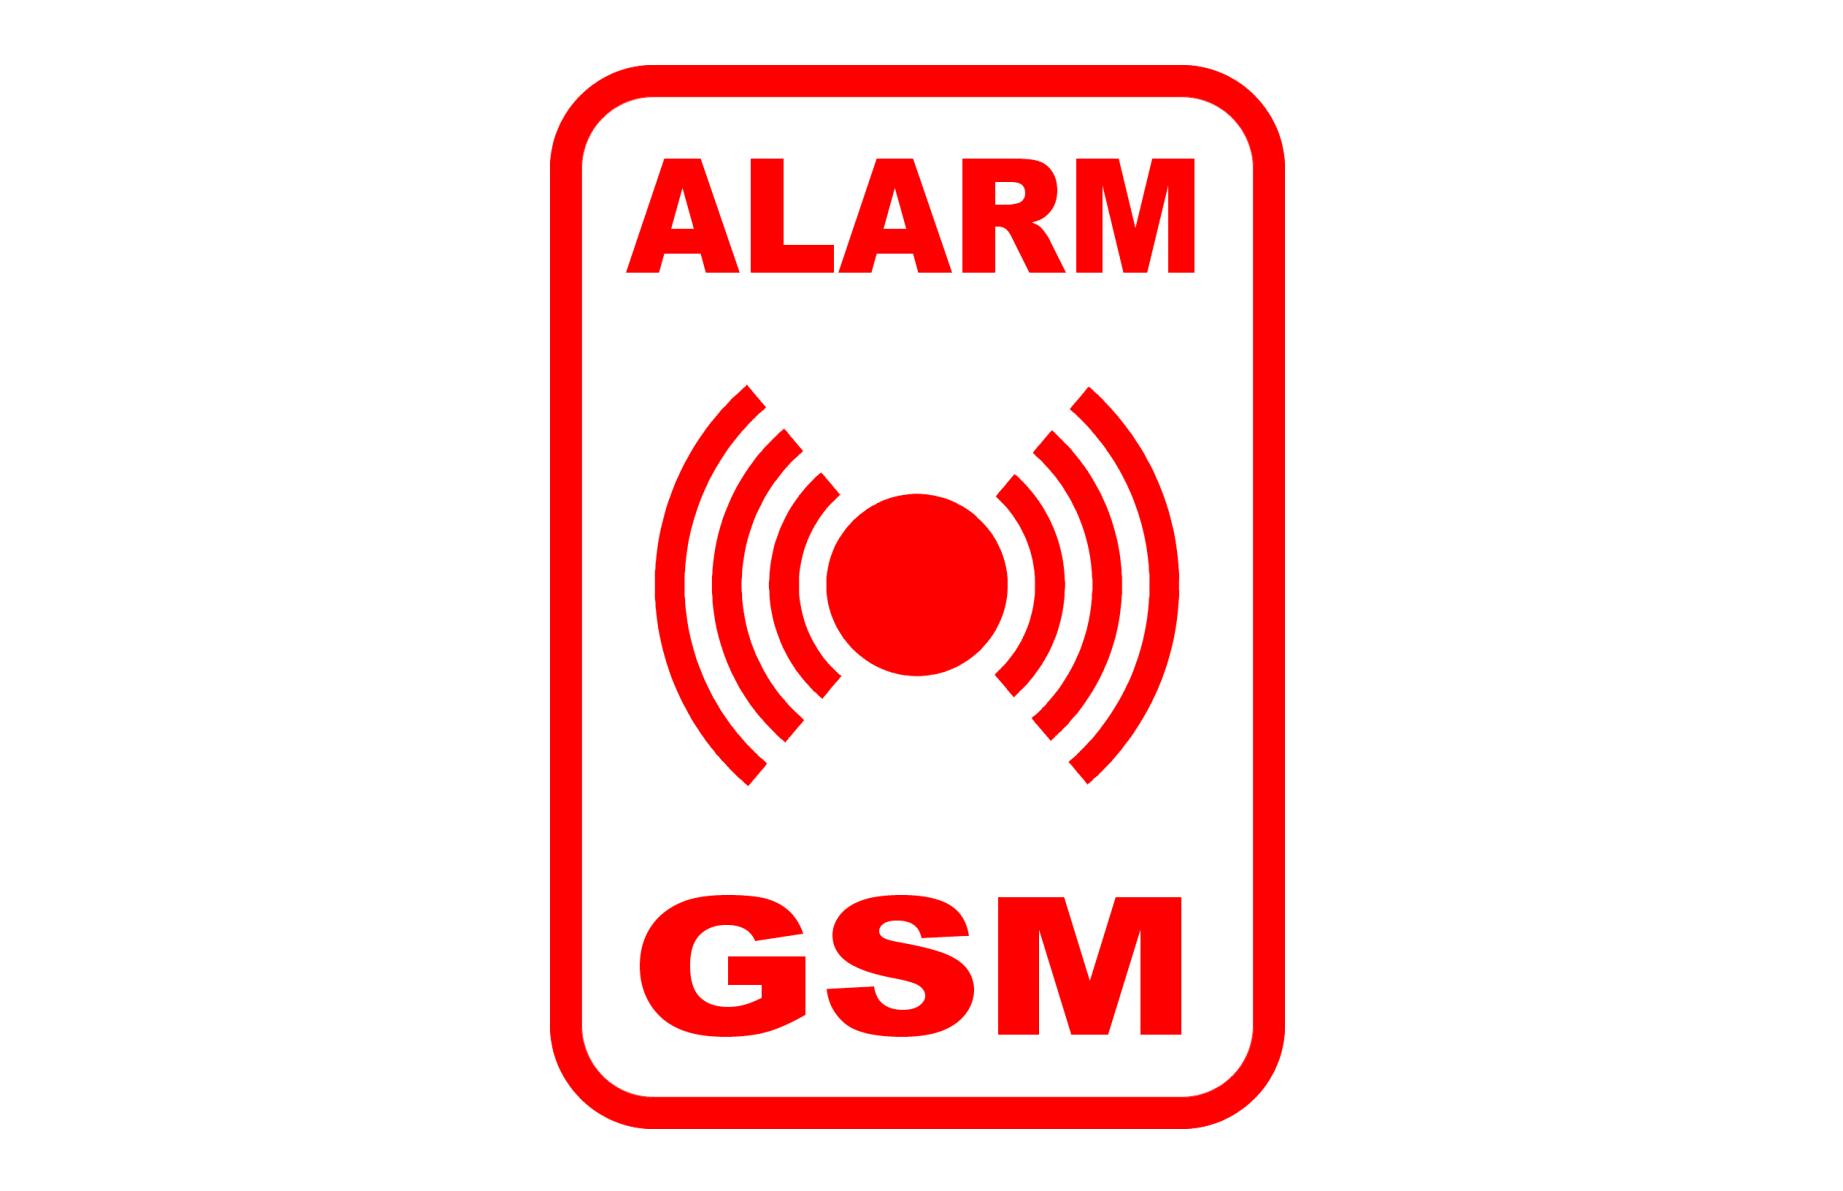 Alarm GSM skilte Overvågning